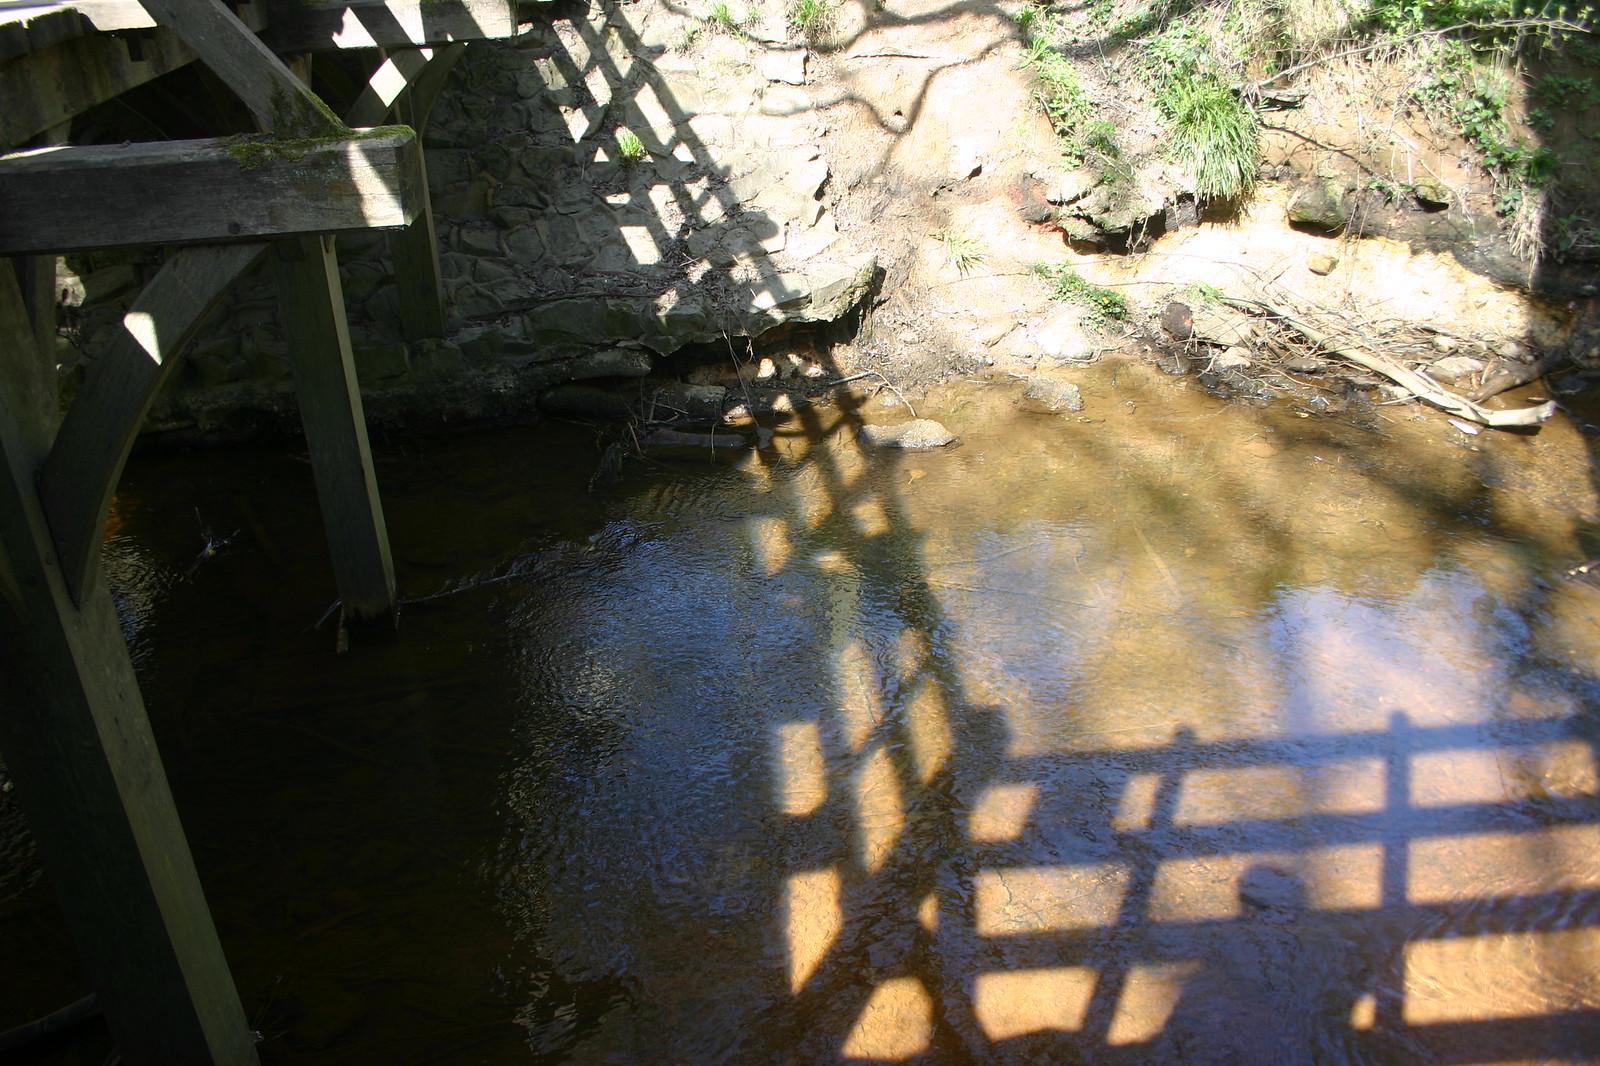 The shadow of the bridge